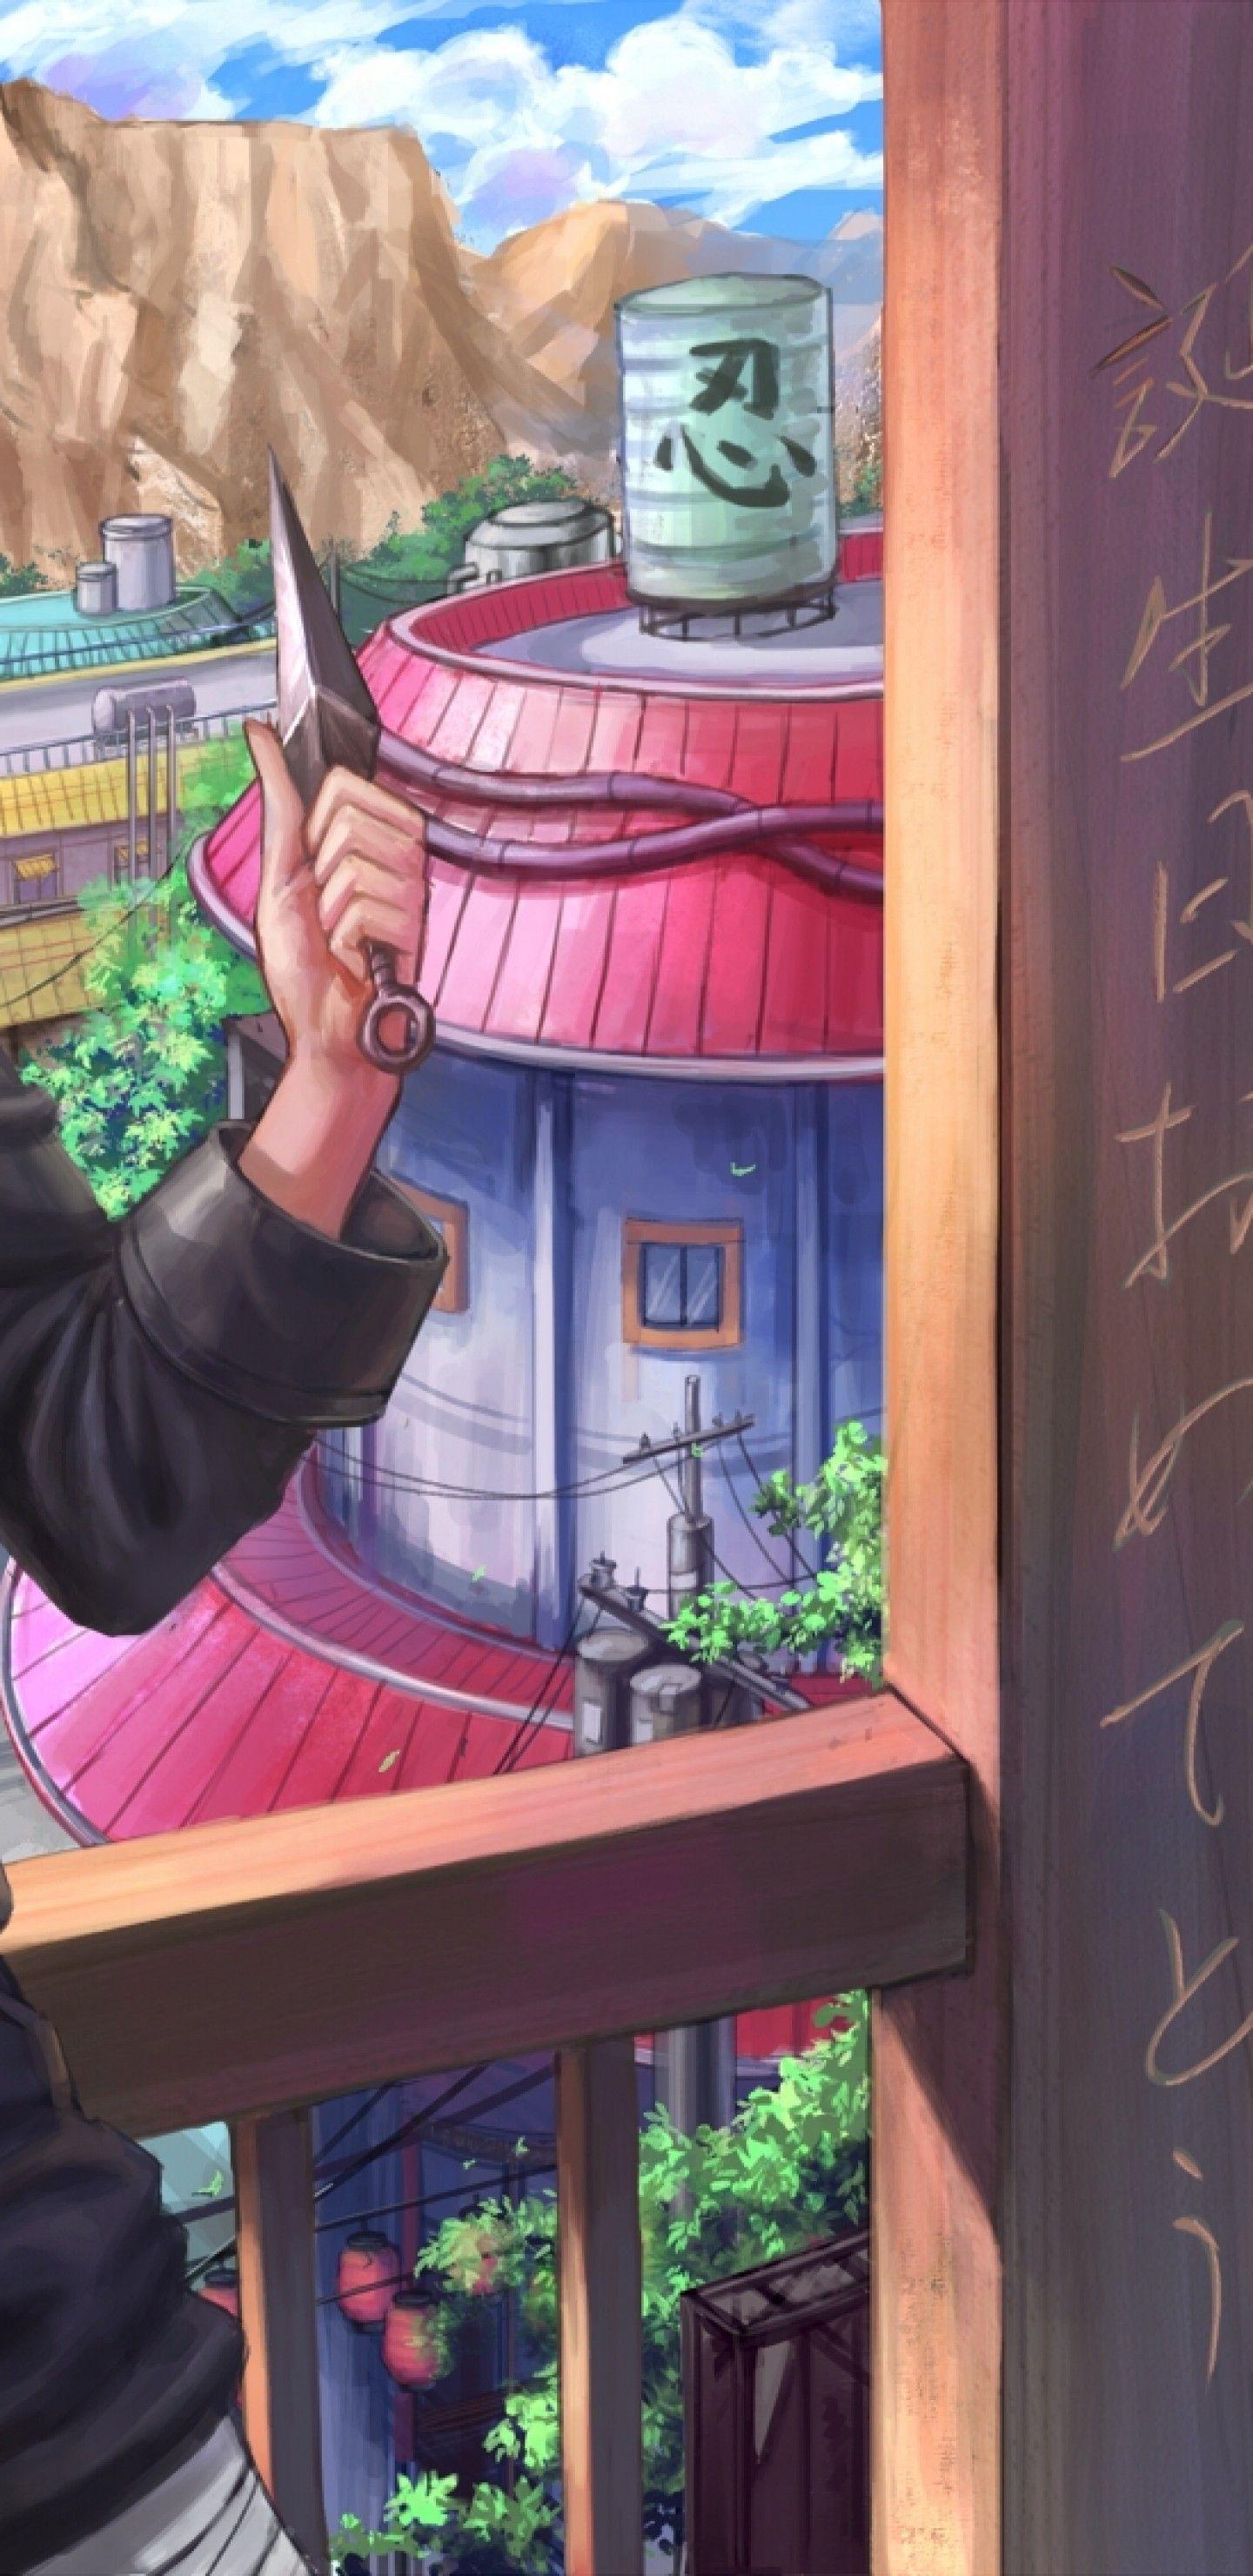 Naruto Village Wallpapers - Top Free Naruto Village Backgrounds - WallpaperAccess